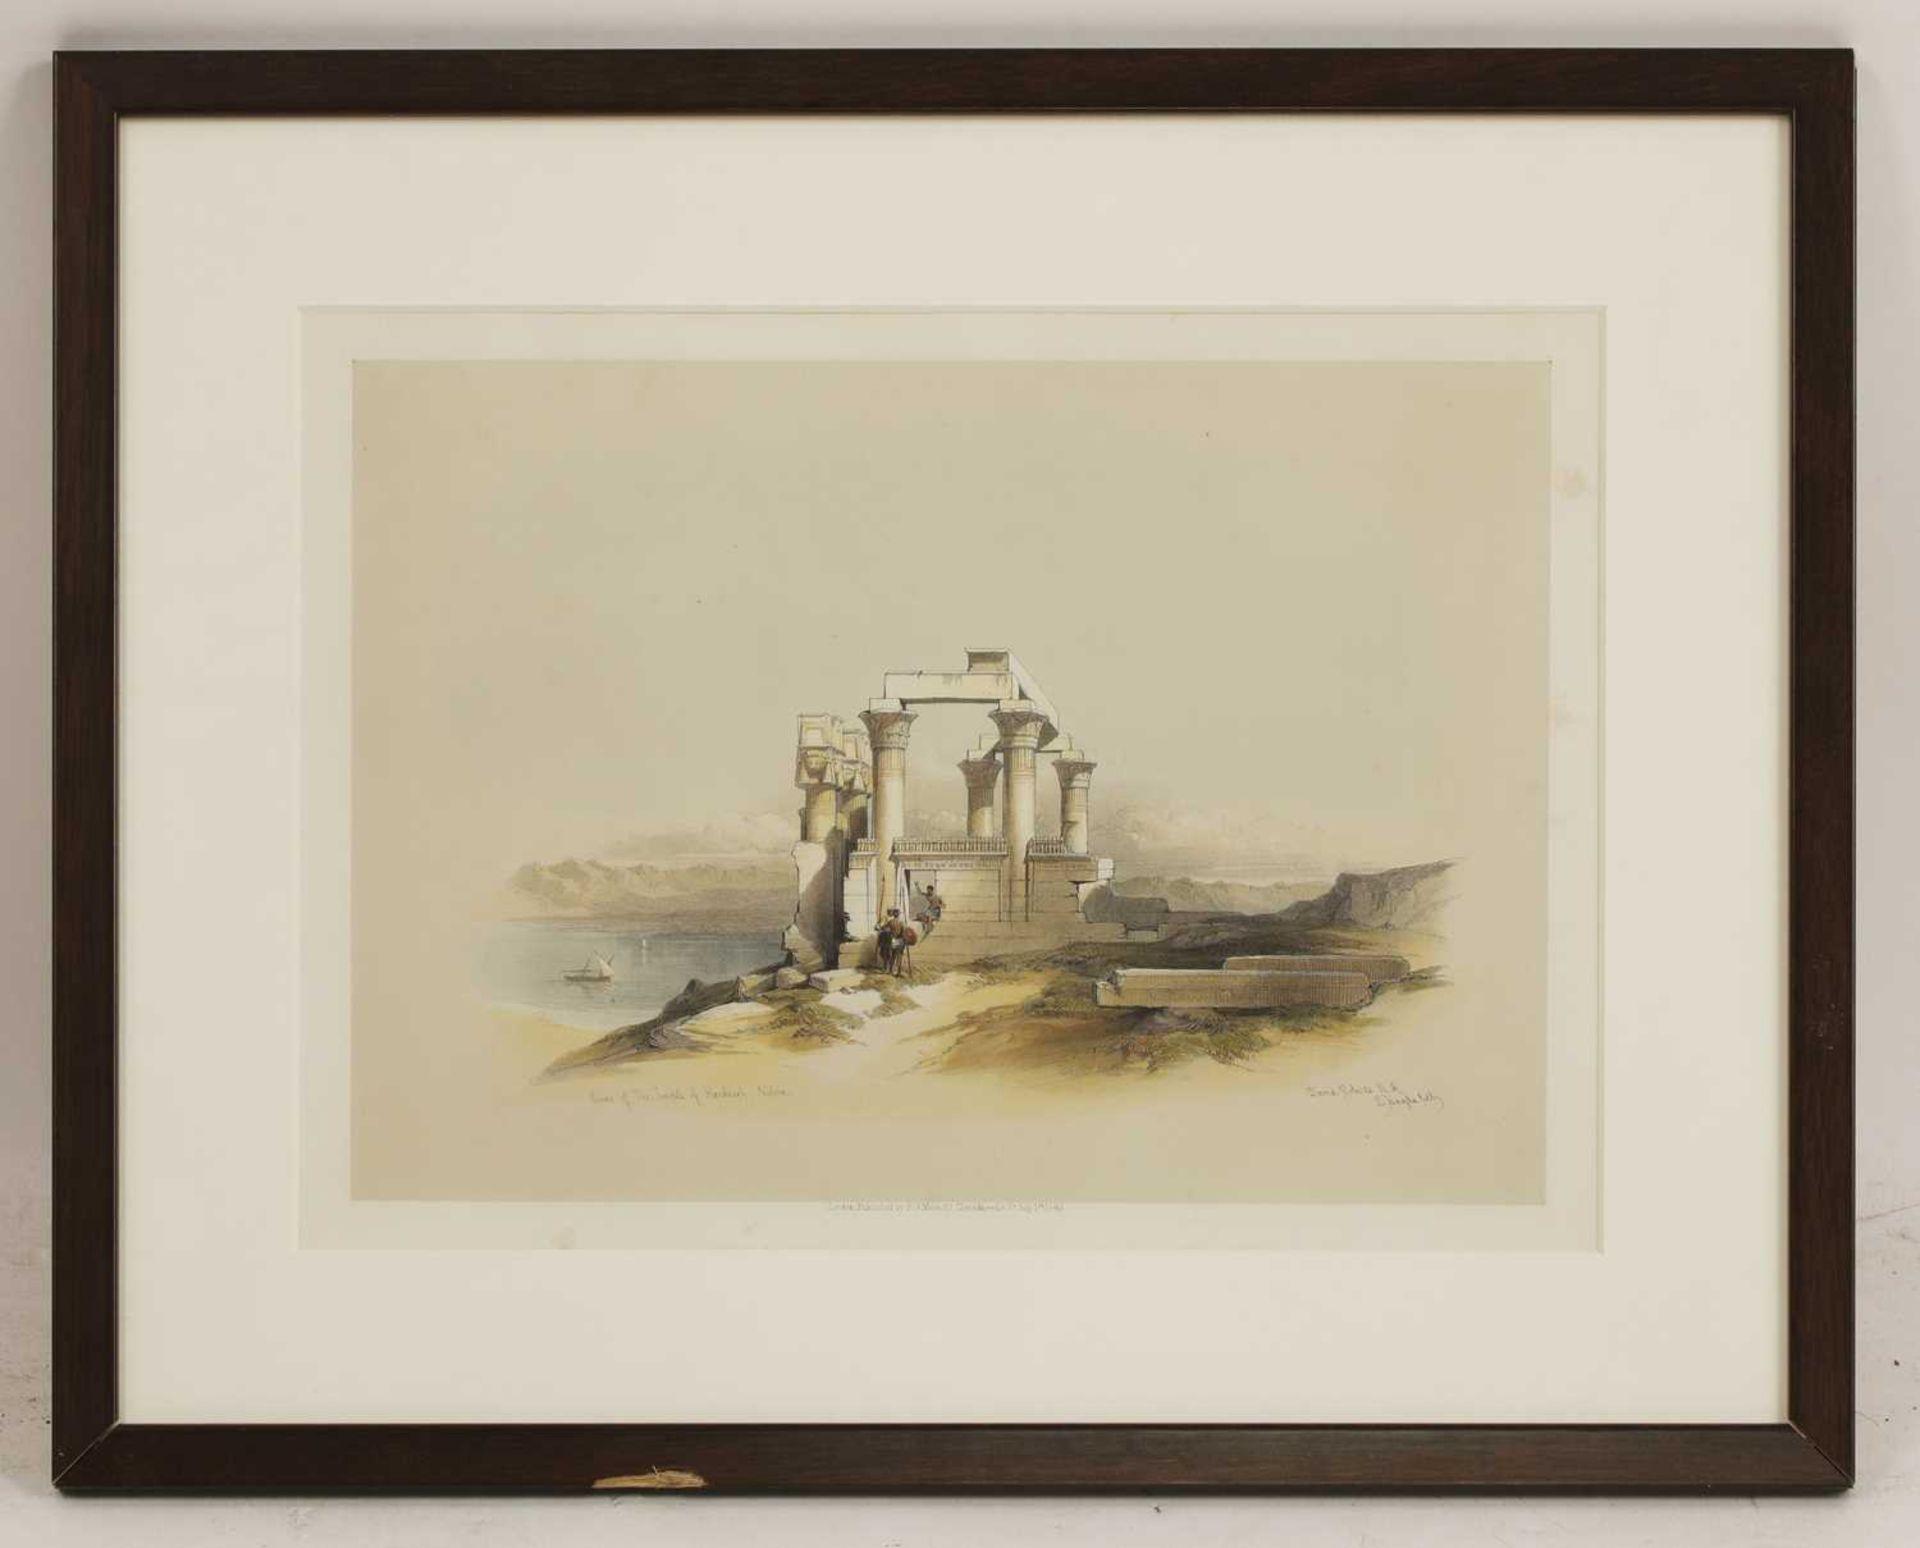 Louis Haghe after David Roberts RA (1796-1864) - Image 14 of 20